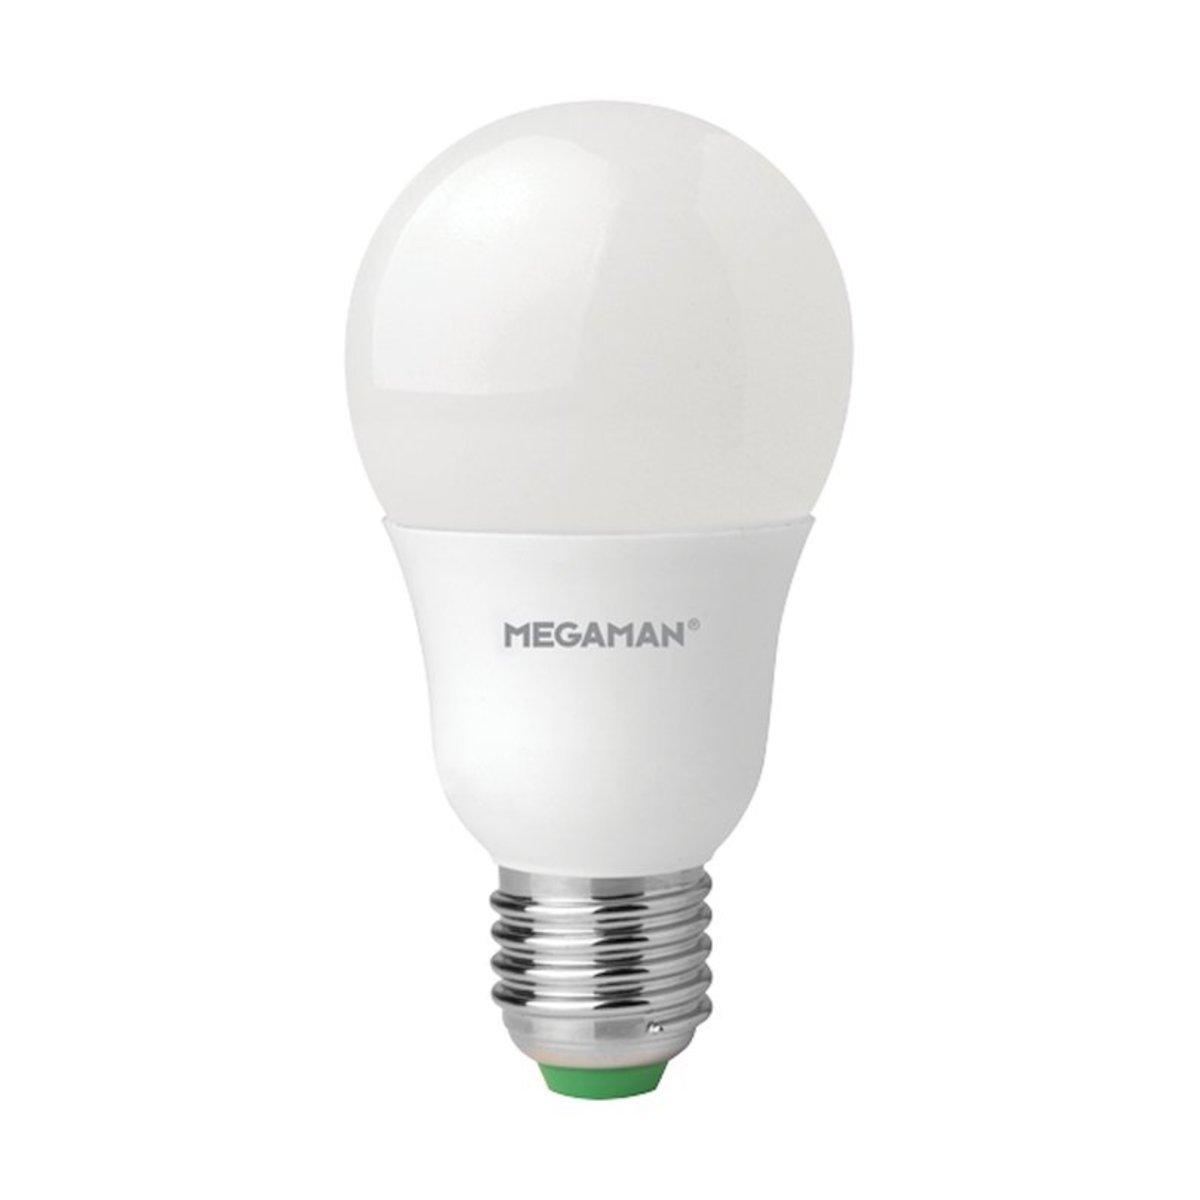 曼佳美 LED 8W E27 6500K 球型 燈膽 冷日光